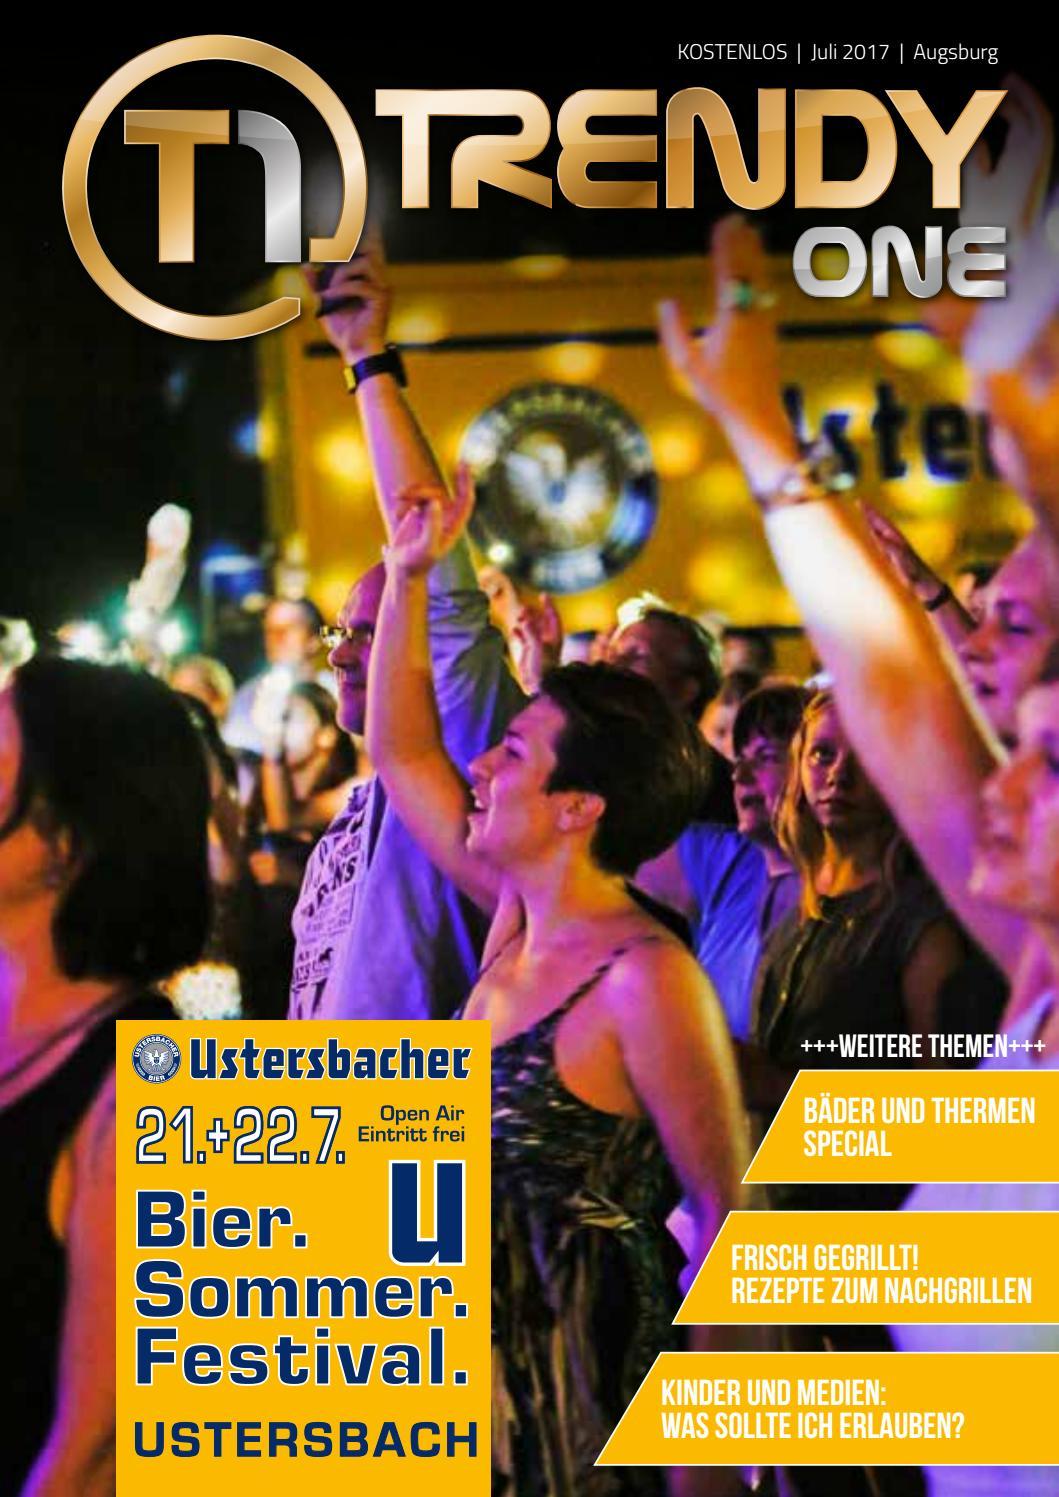 TRENDYone   Das Magazin - Augsburg - Juli 2017 by ad can do GmbH ...